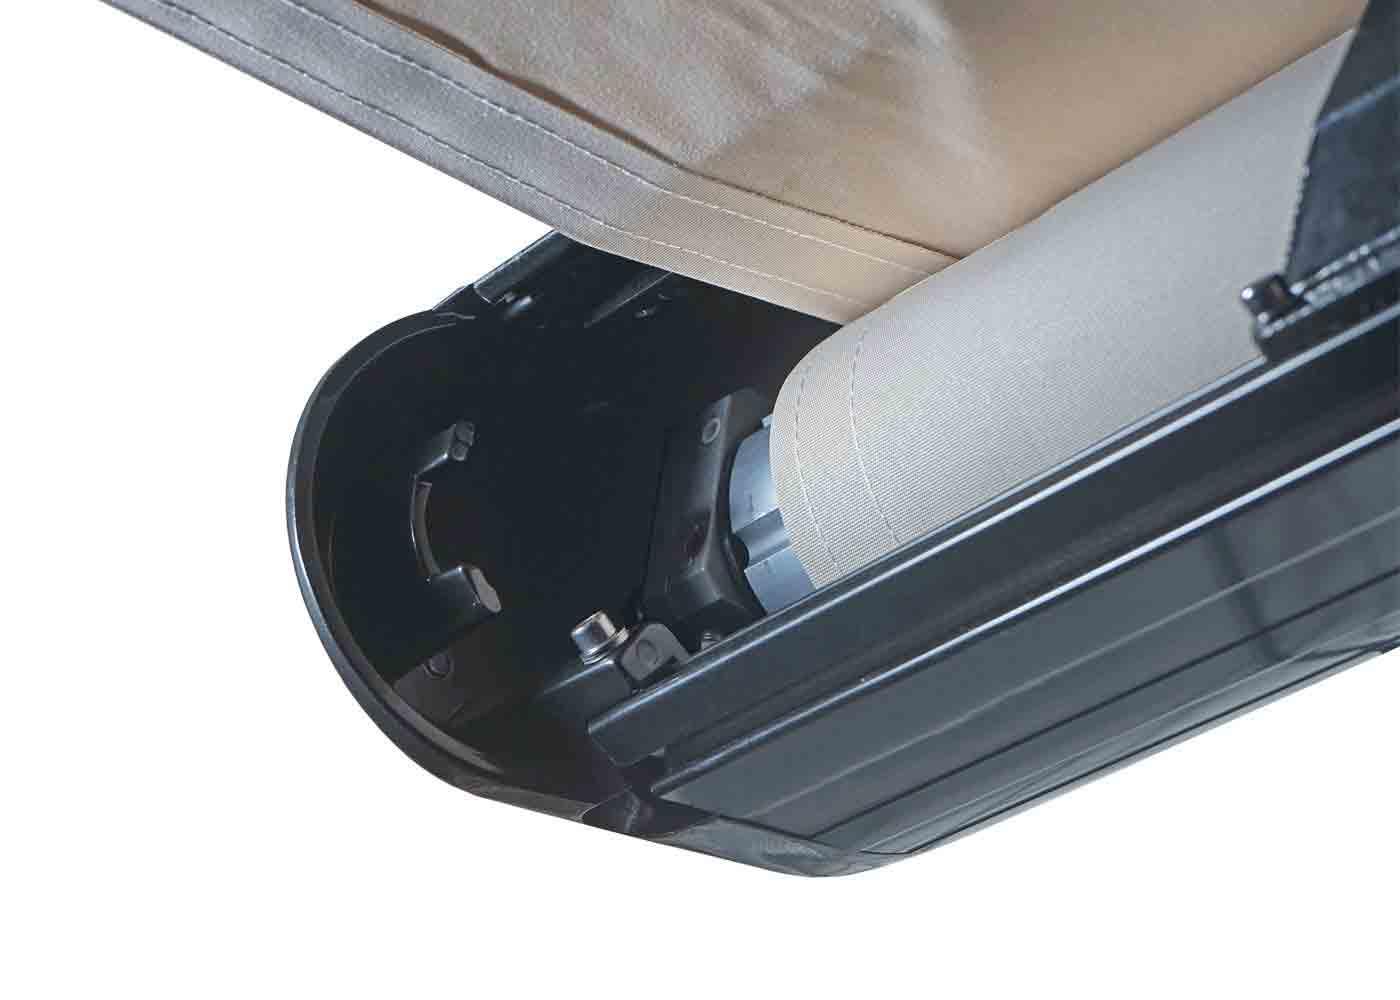 elektrische vollkassetten markise t124 4x3m ausfahrbarer volant polyester creme anthrazit. Black Bedroom Furniture Sets. Home Design Ideas